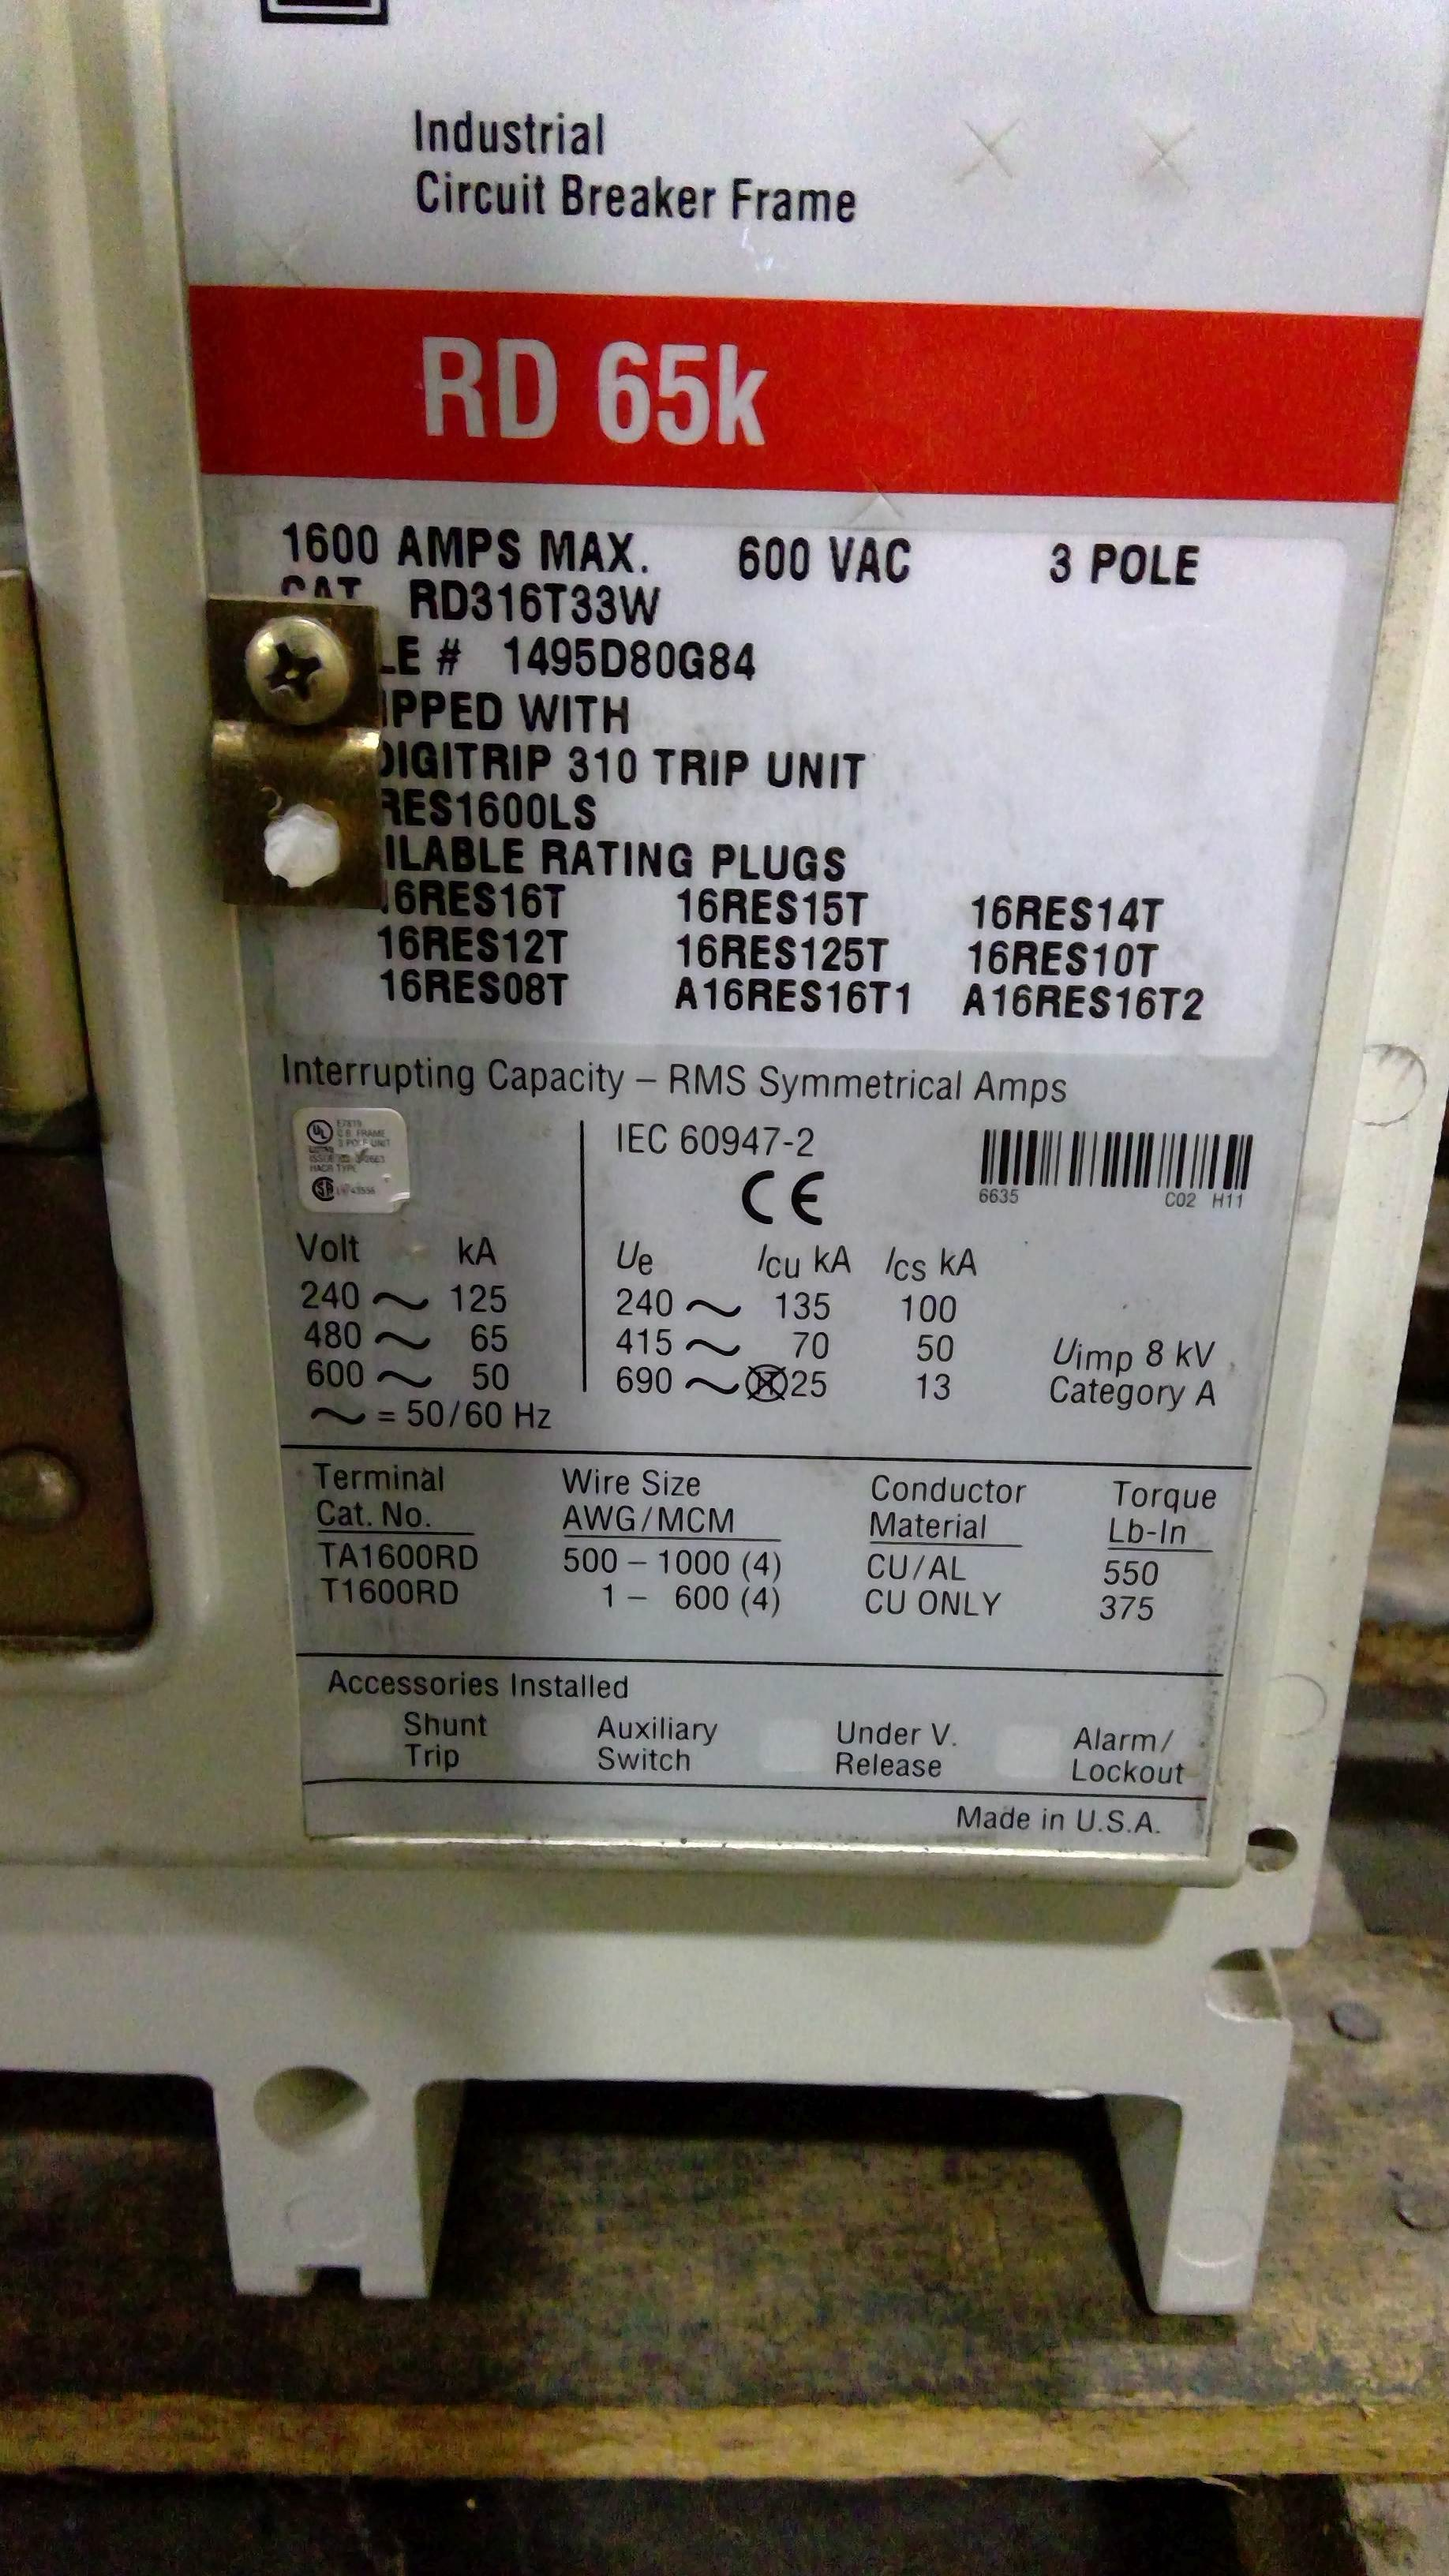 EATON CUTLER-HAMMER POW-R-WAY III 1600 AMP RD65K CIRCUIT BREAKER (4 AVAILABLE)